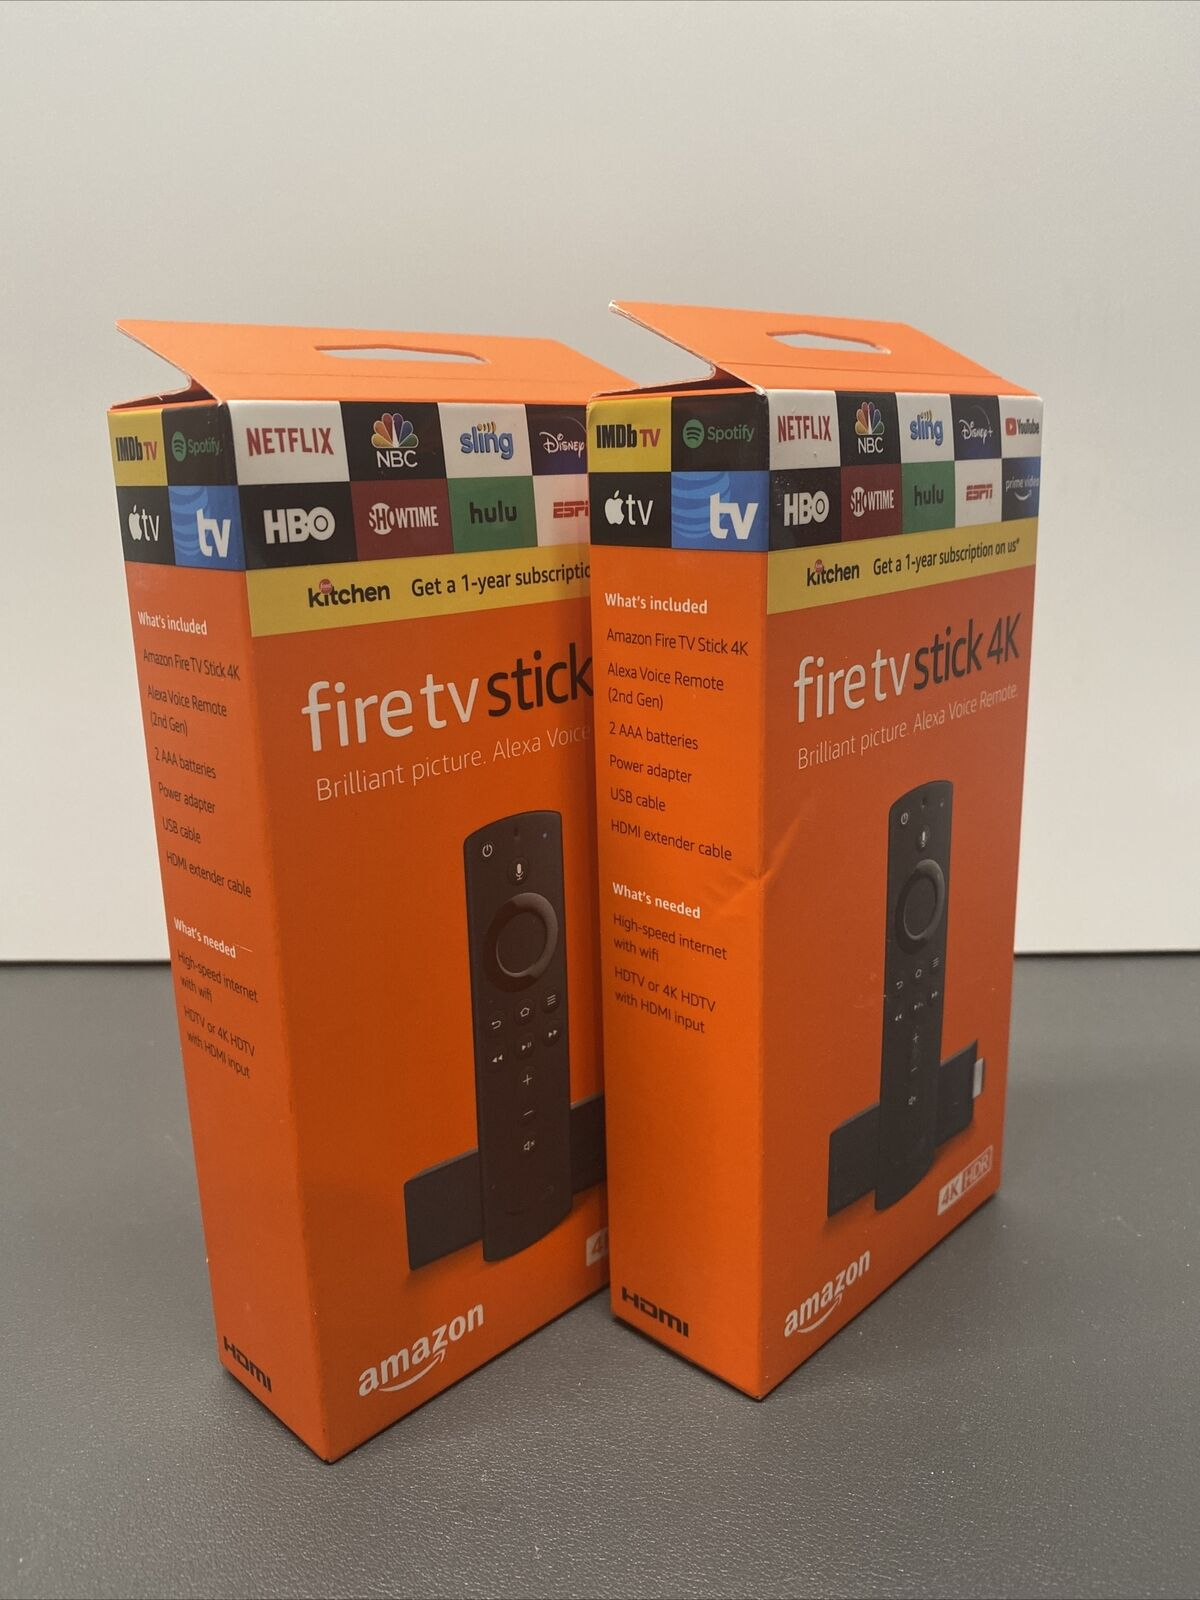 Amazon Fire TV Stick 4K Streaming Media Player / Alexa QUANTITY 2! Free Shipping alexa amazon fire free media player quantity shipping stick streaming